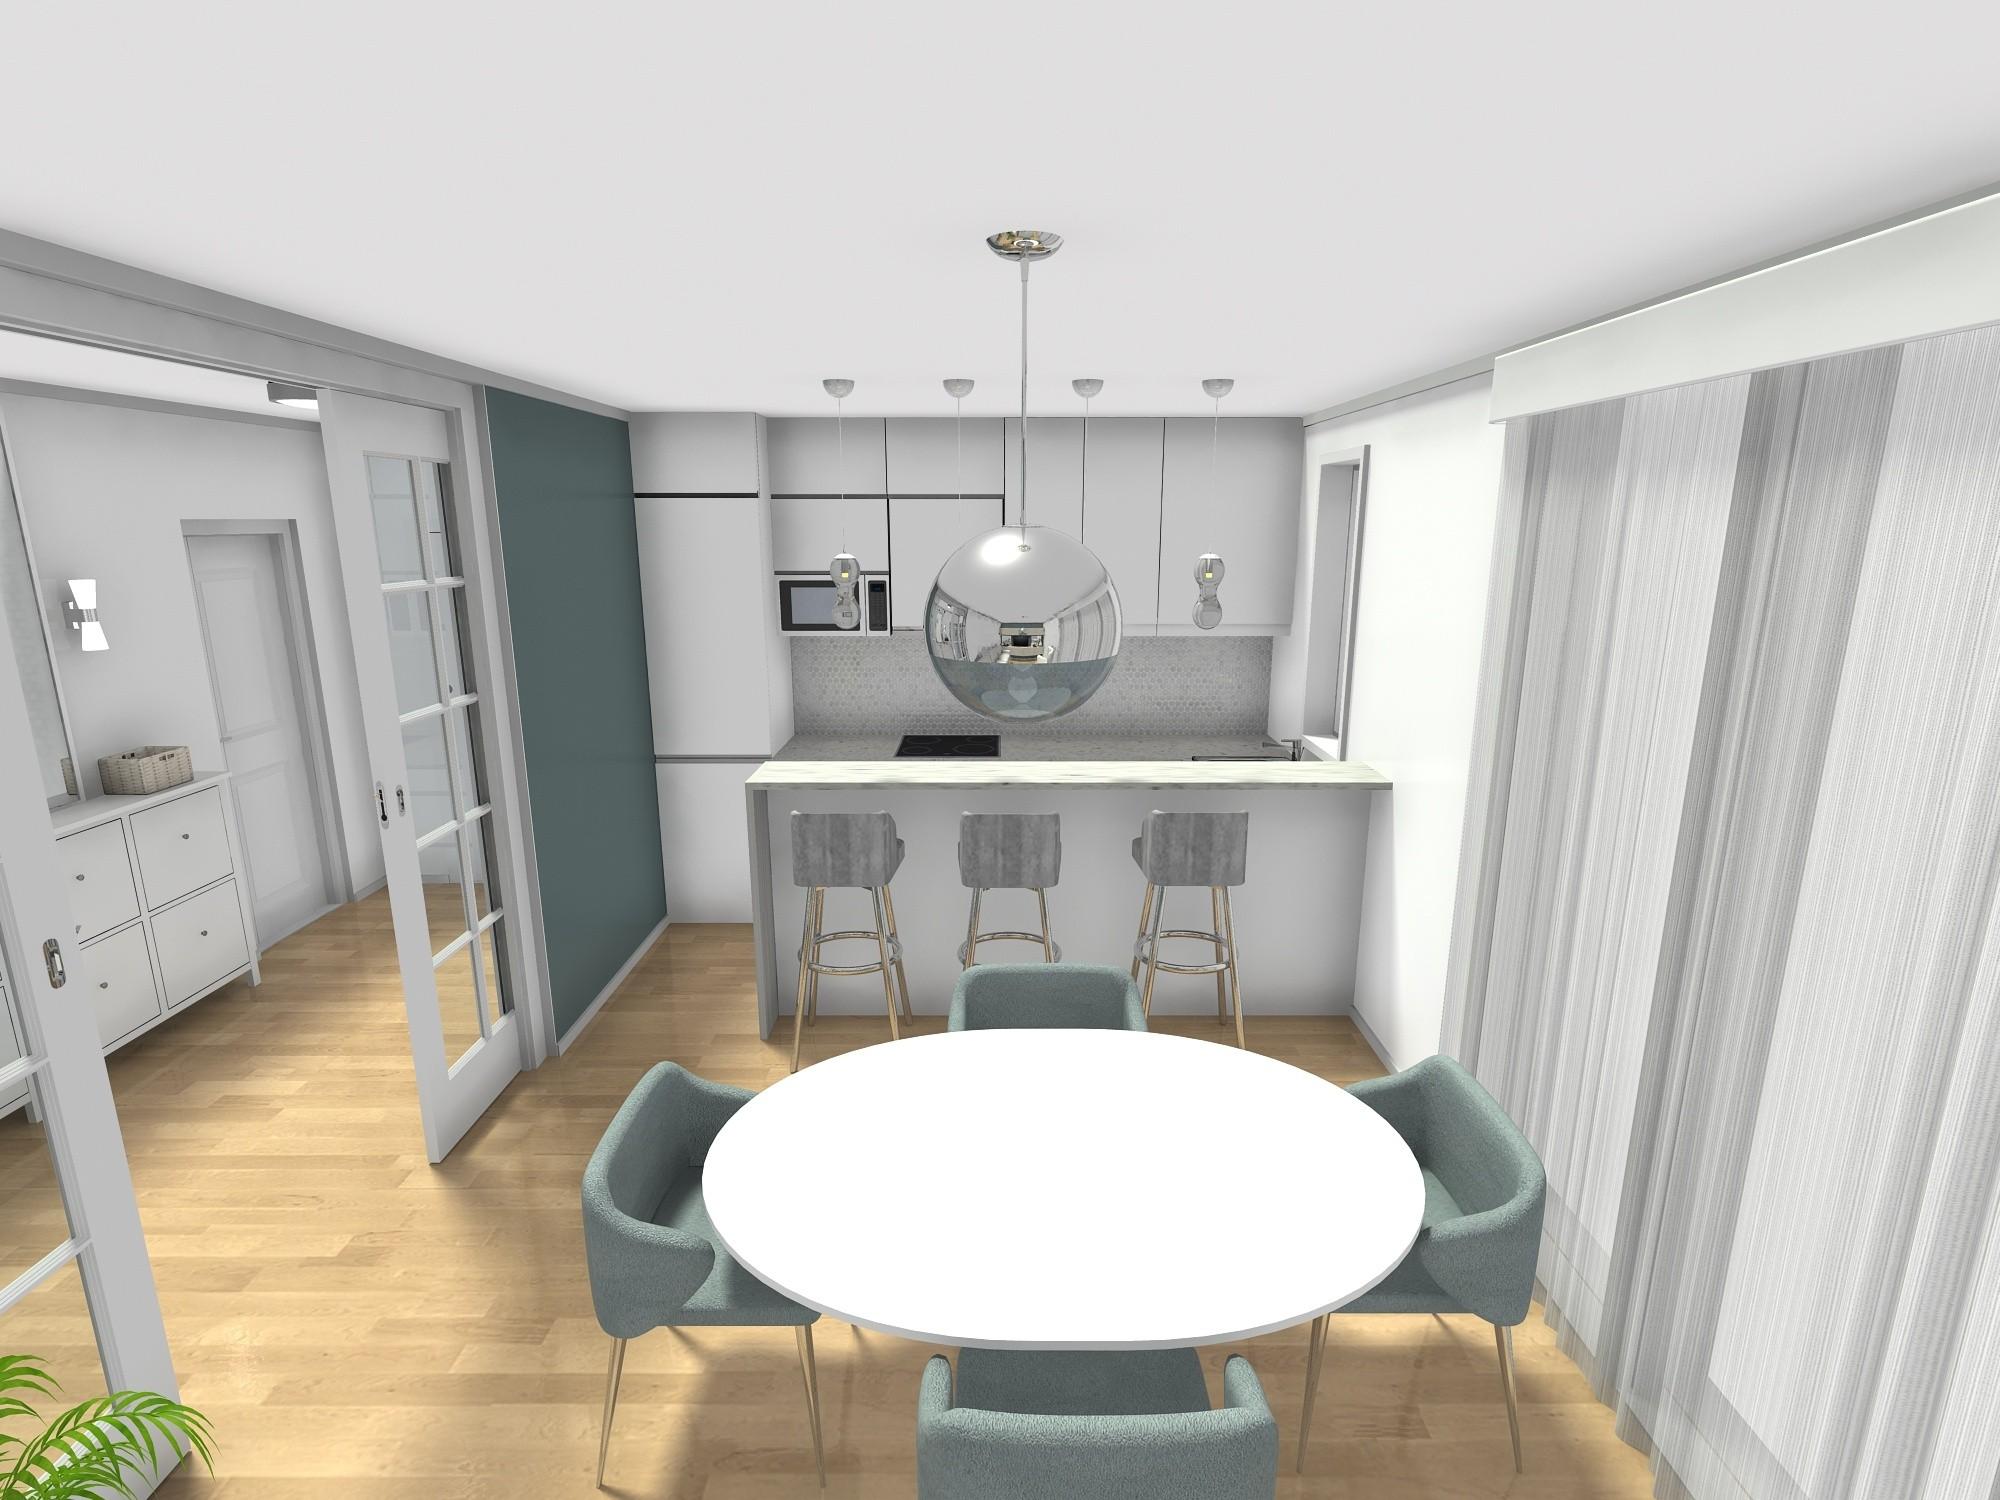 trosoban stan 60 m2 kuhinja i blagovaonica